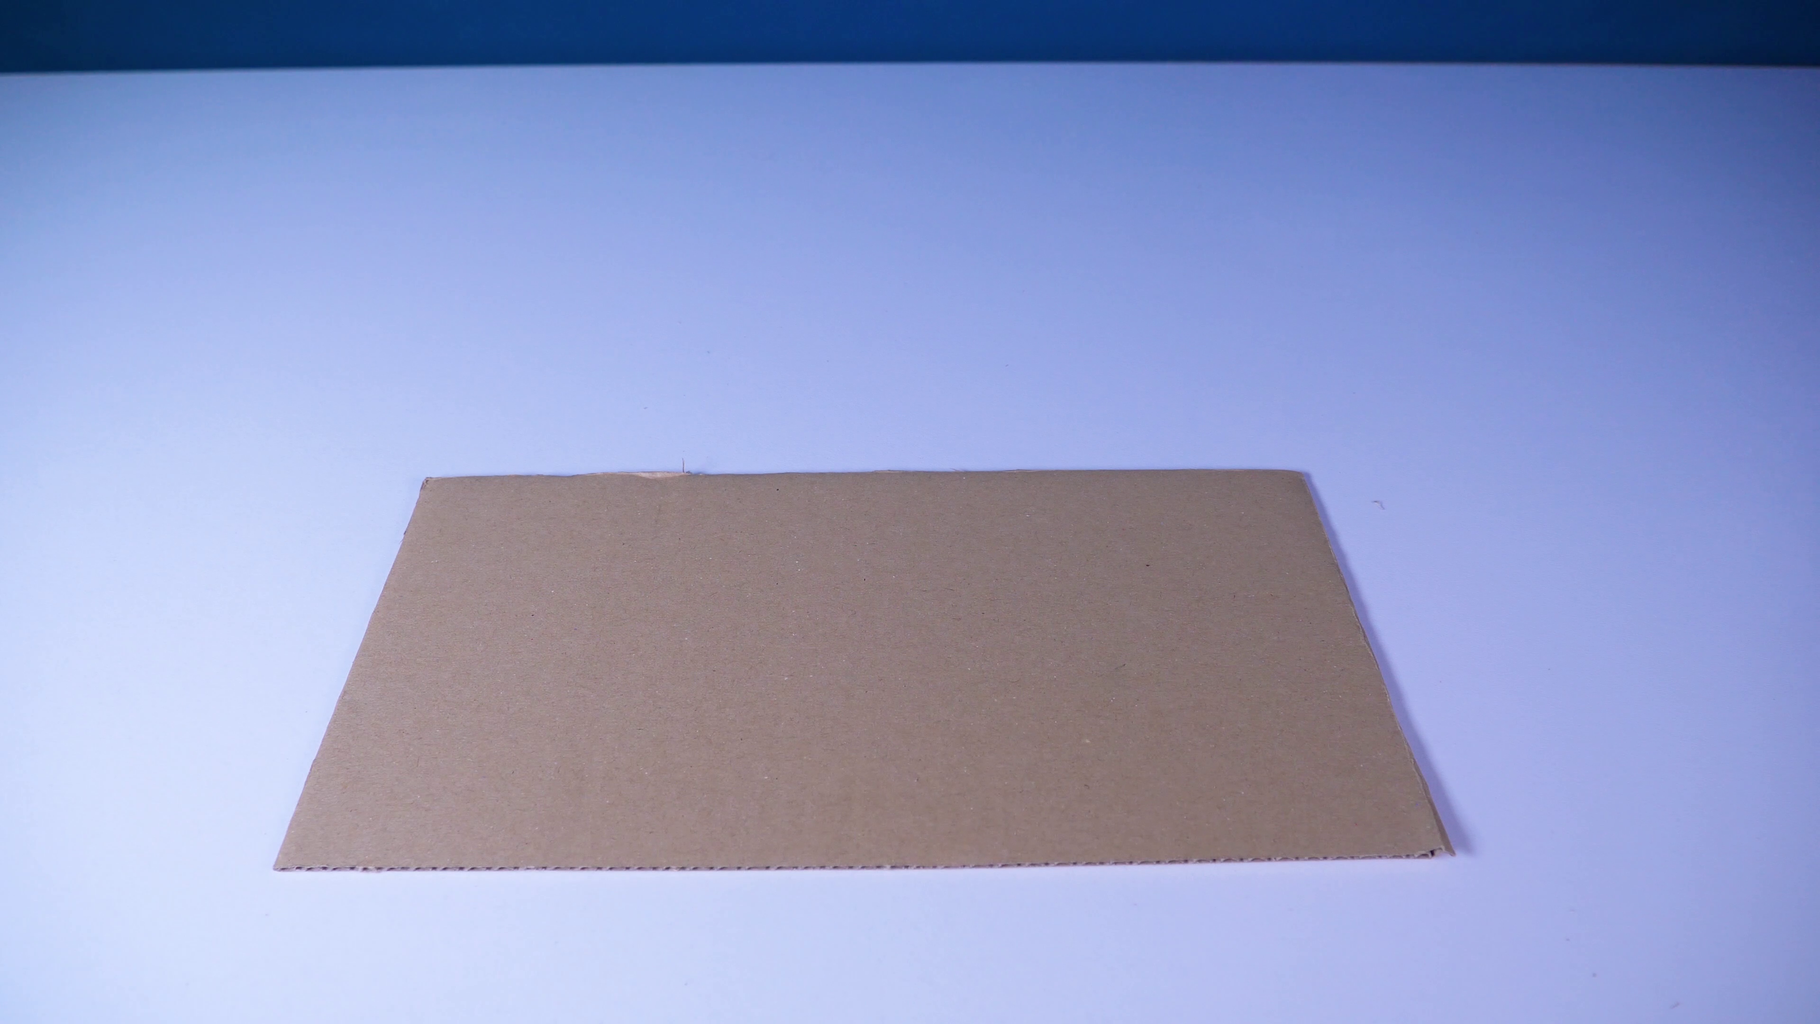 Cardboard Support